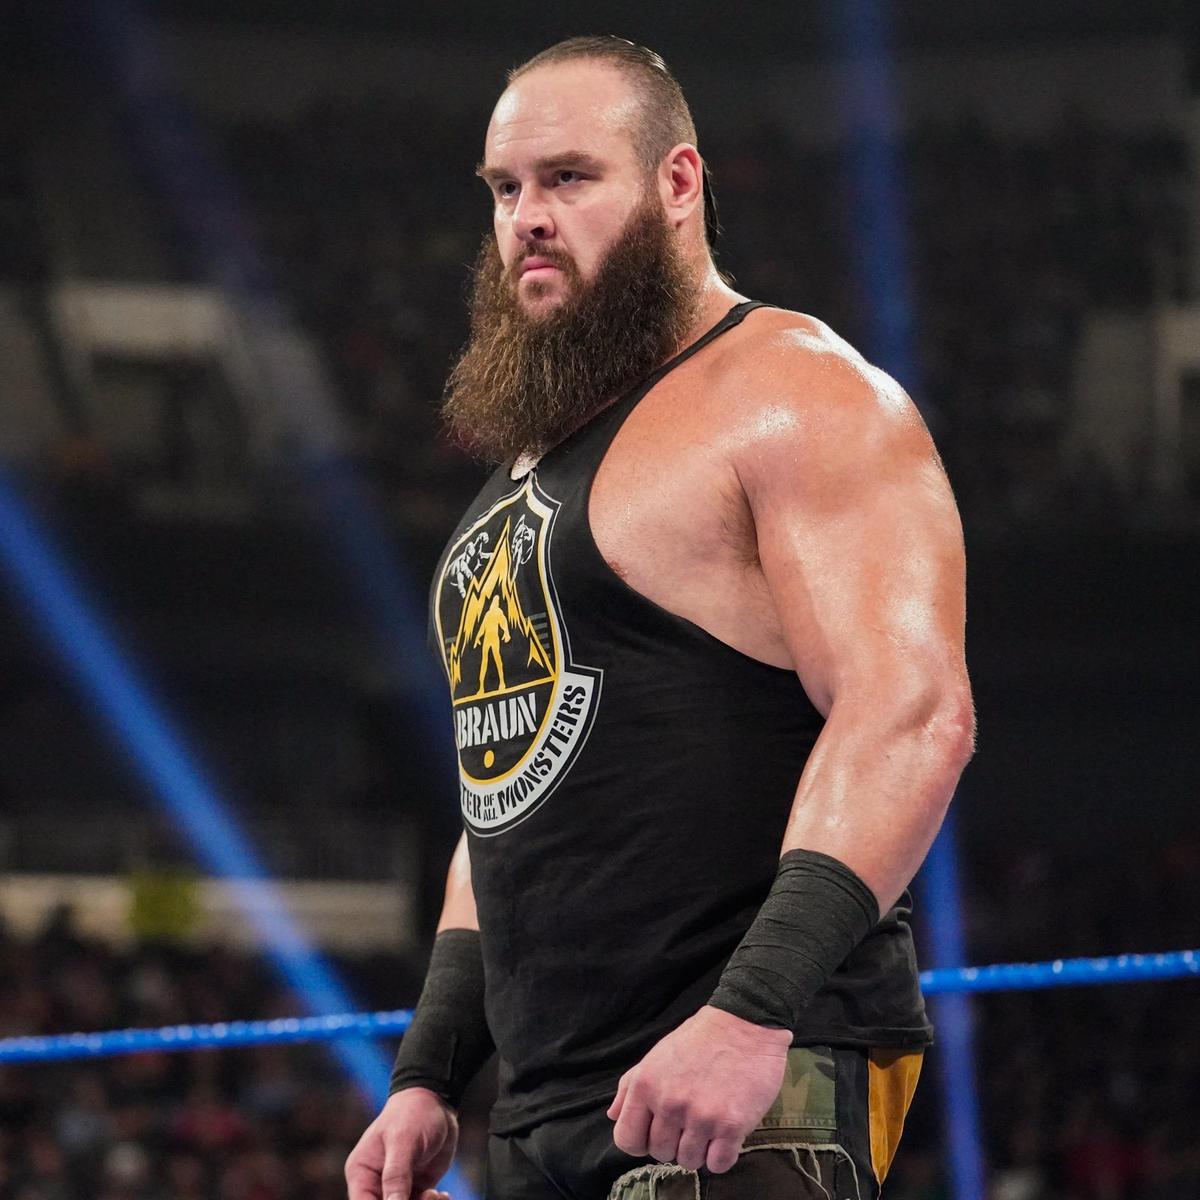 Braun Strowman vs. Shinsuke Nakamura: photos | WWE